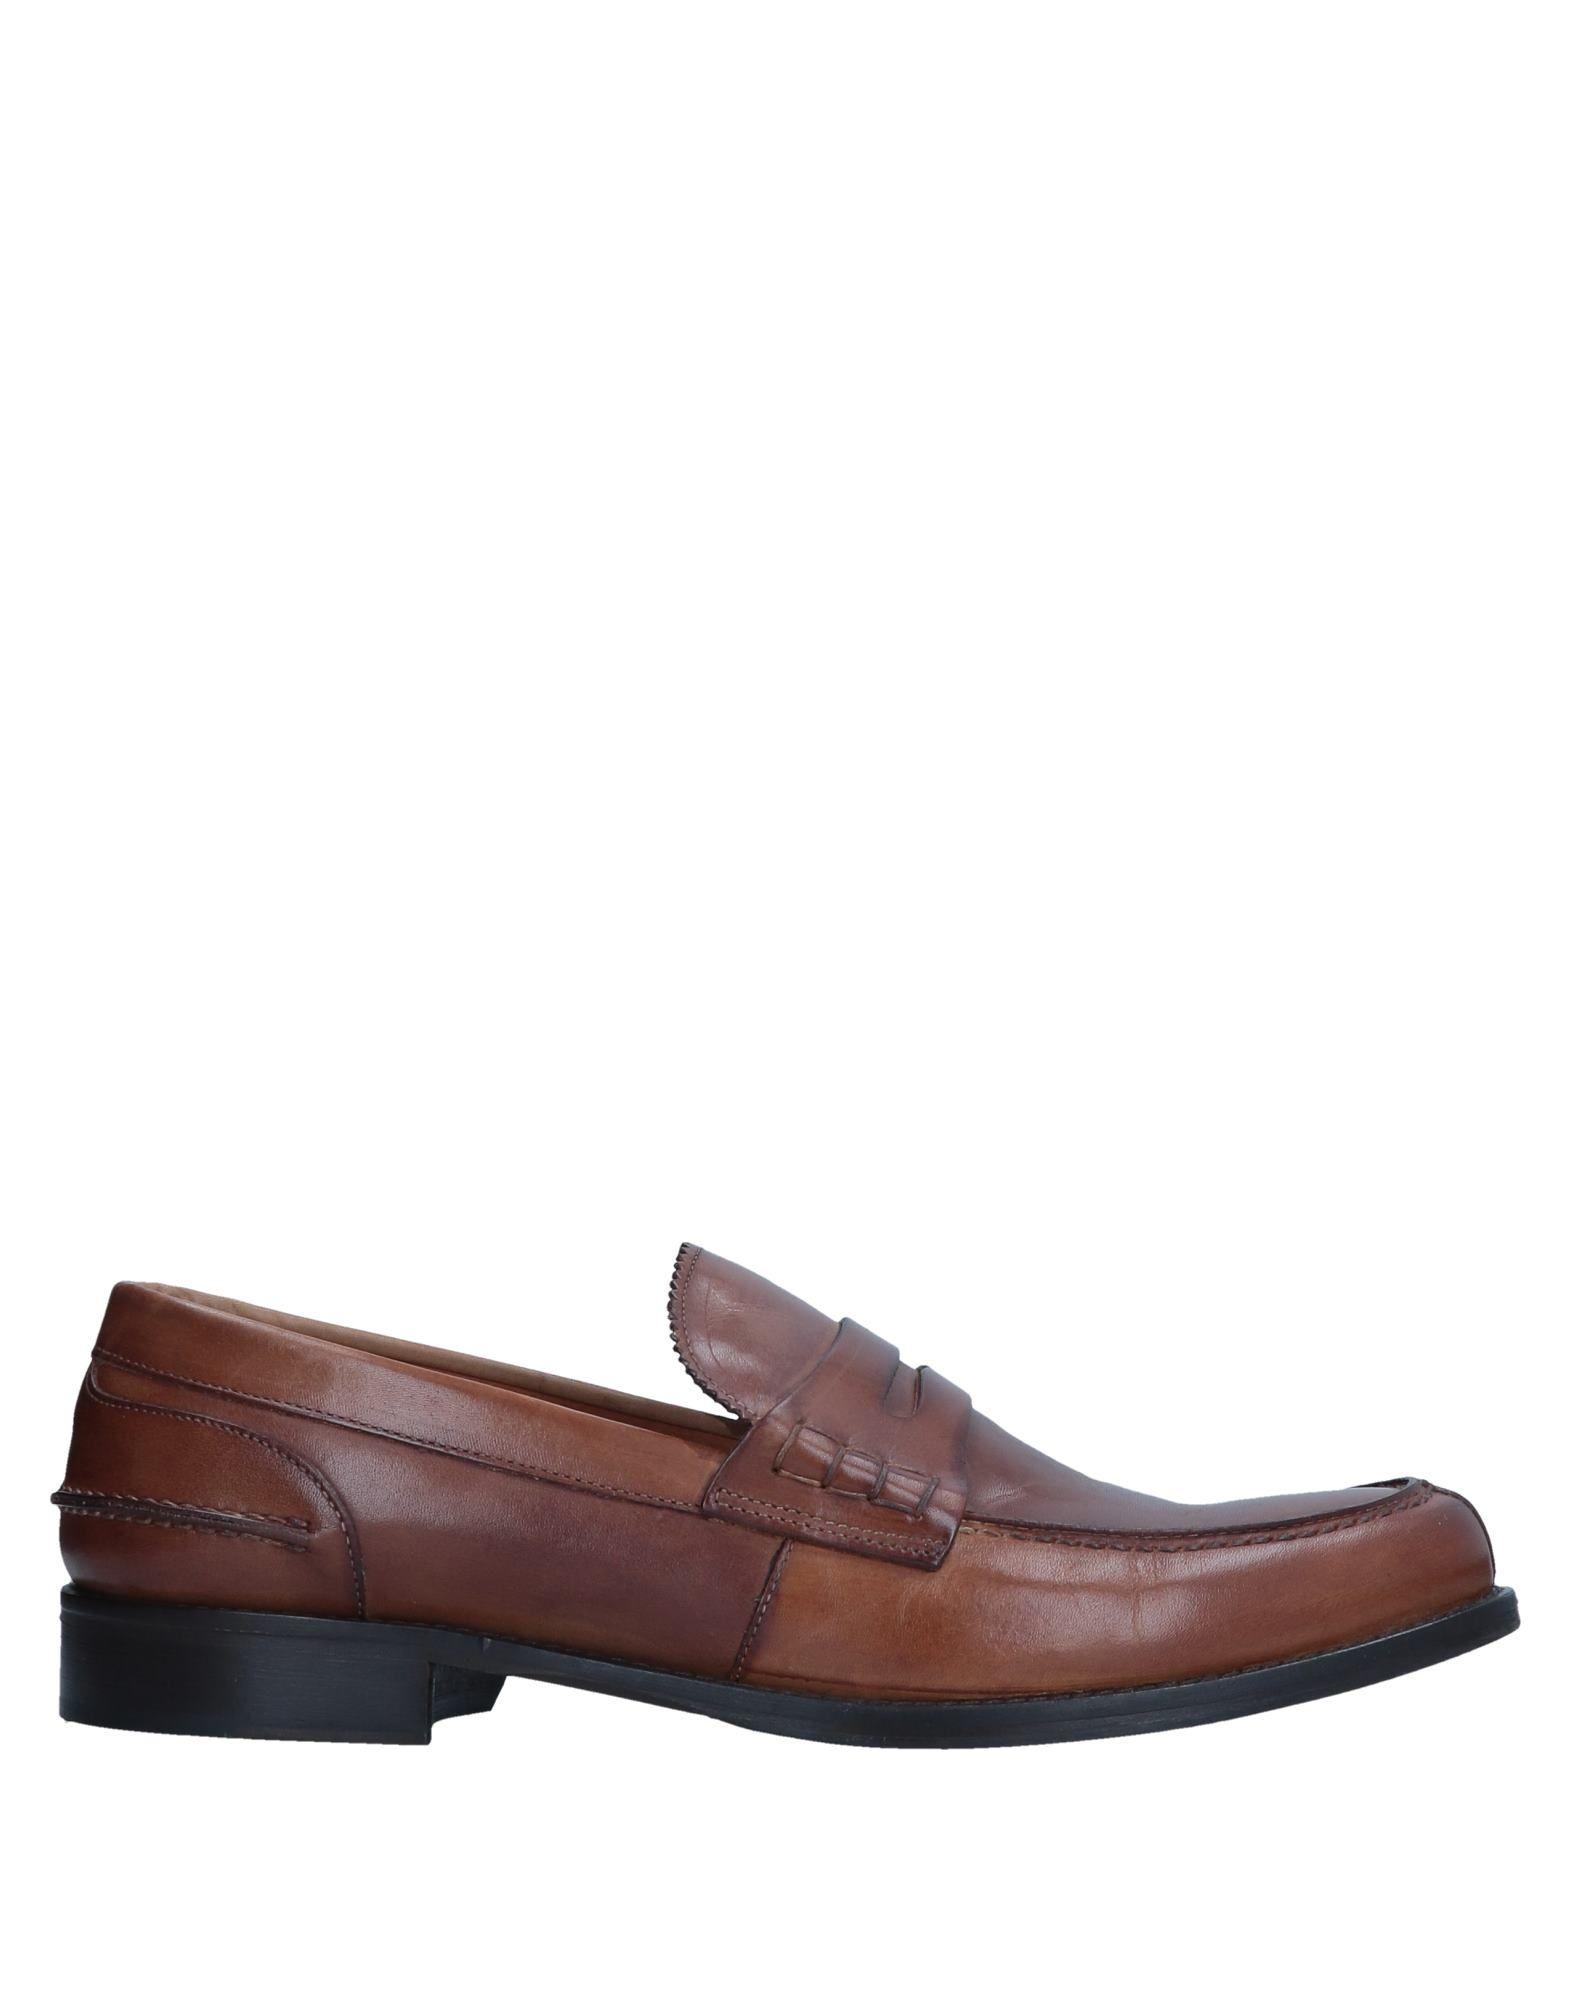 Alexander Trend Mokassins Herren  11559525BB Gute Qualität beliebte Schuhe